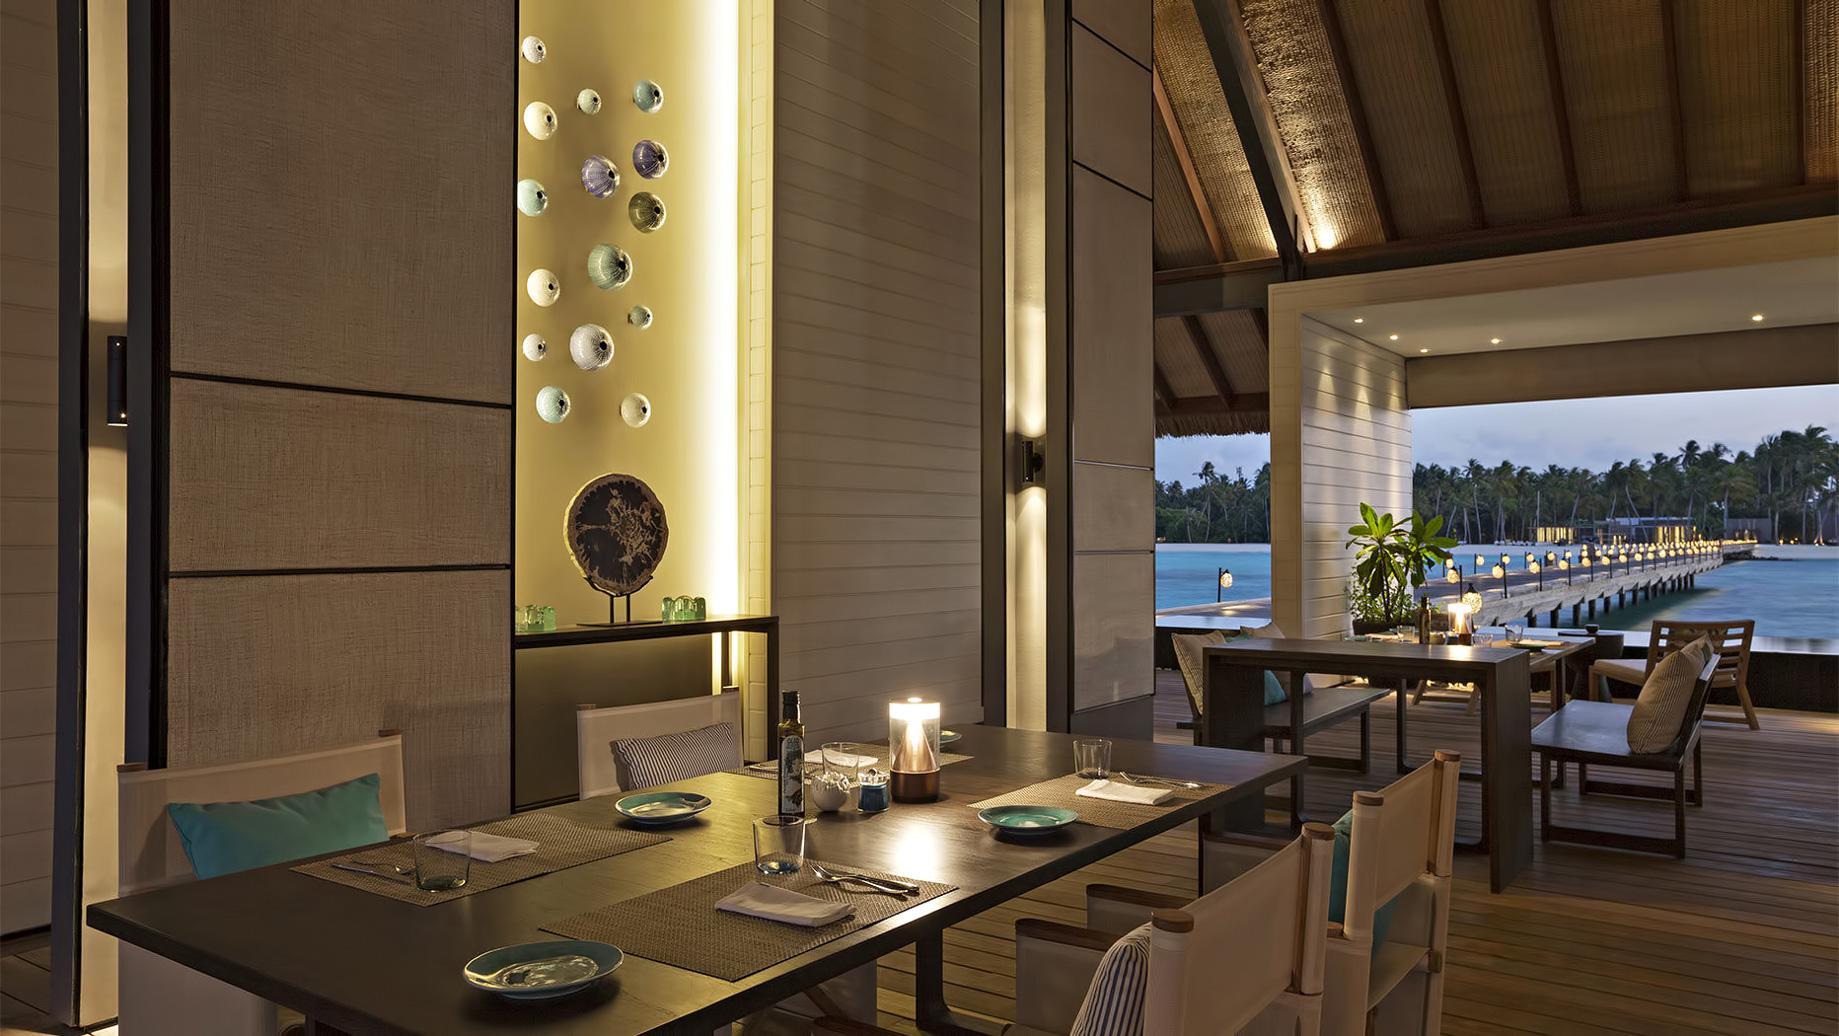 Cheval Blanc Randheli Luxury Resort - Noonu Atoll, Maldives - Deelani Restaurant Sunset